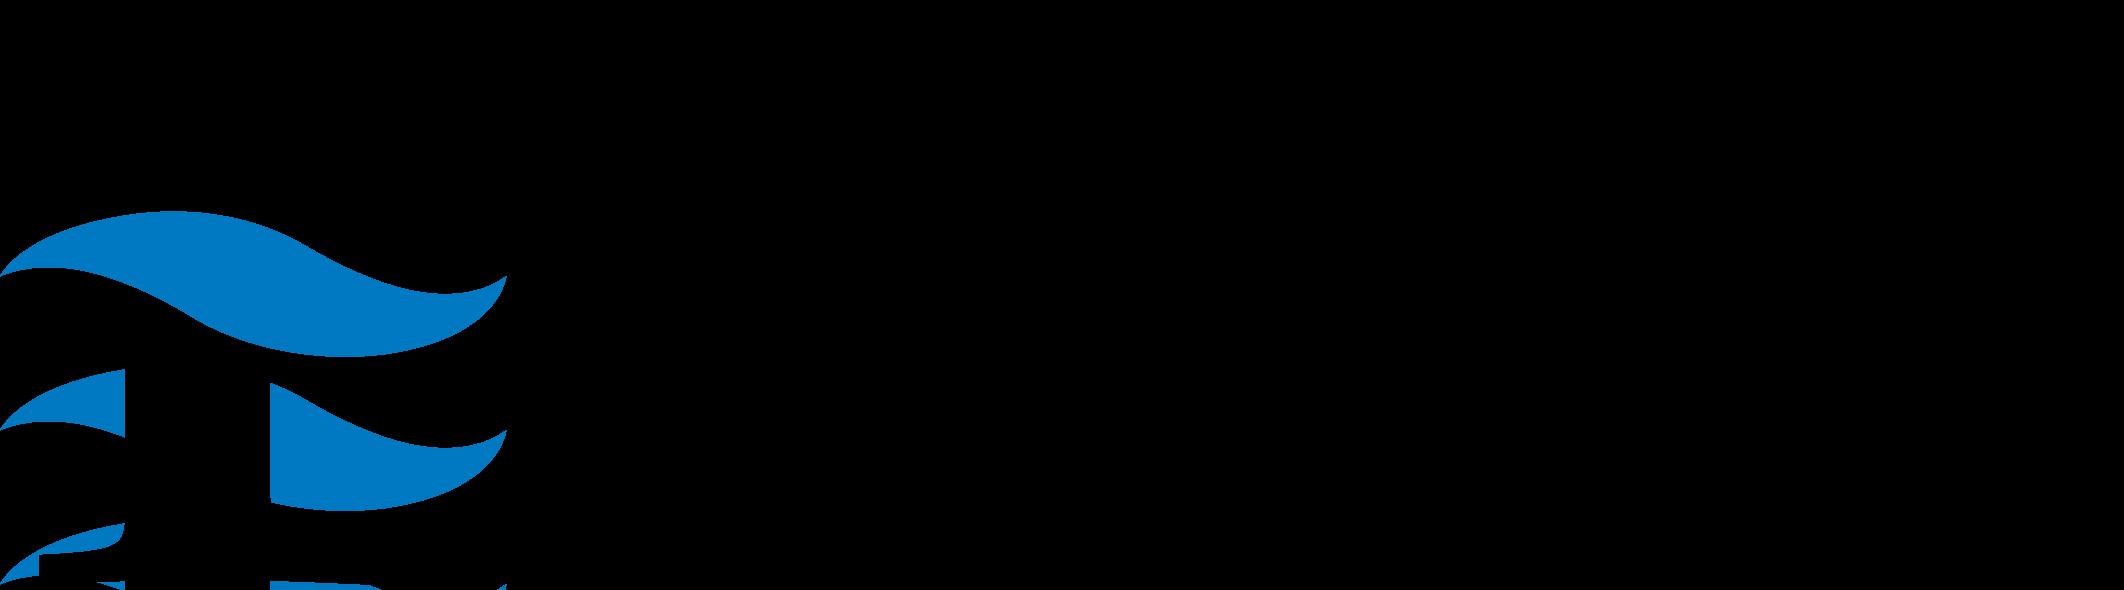 Fypon Logo 1